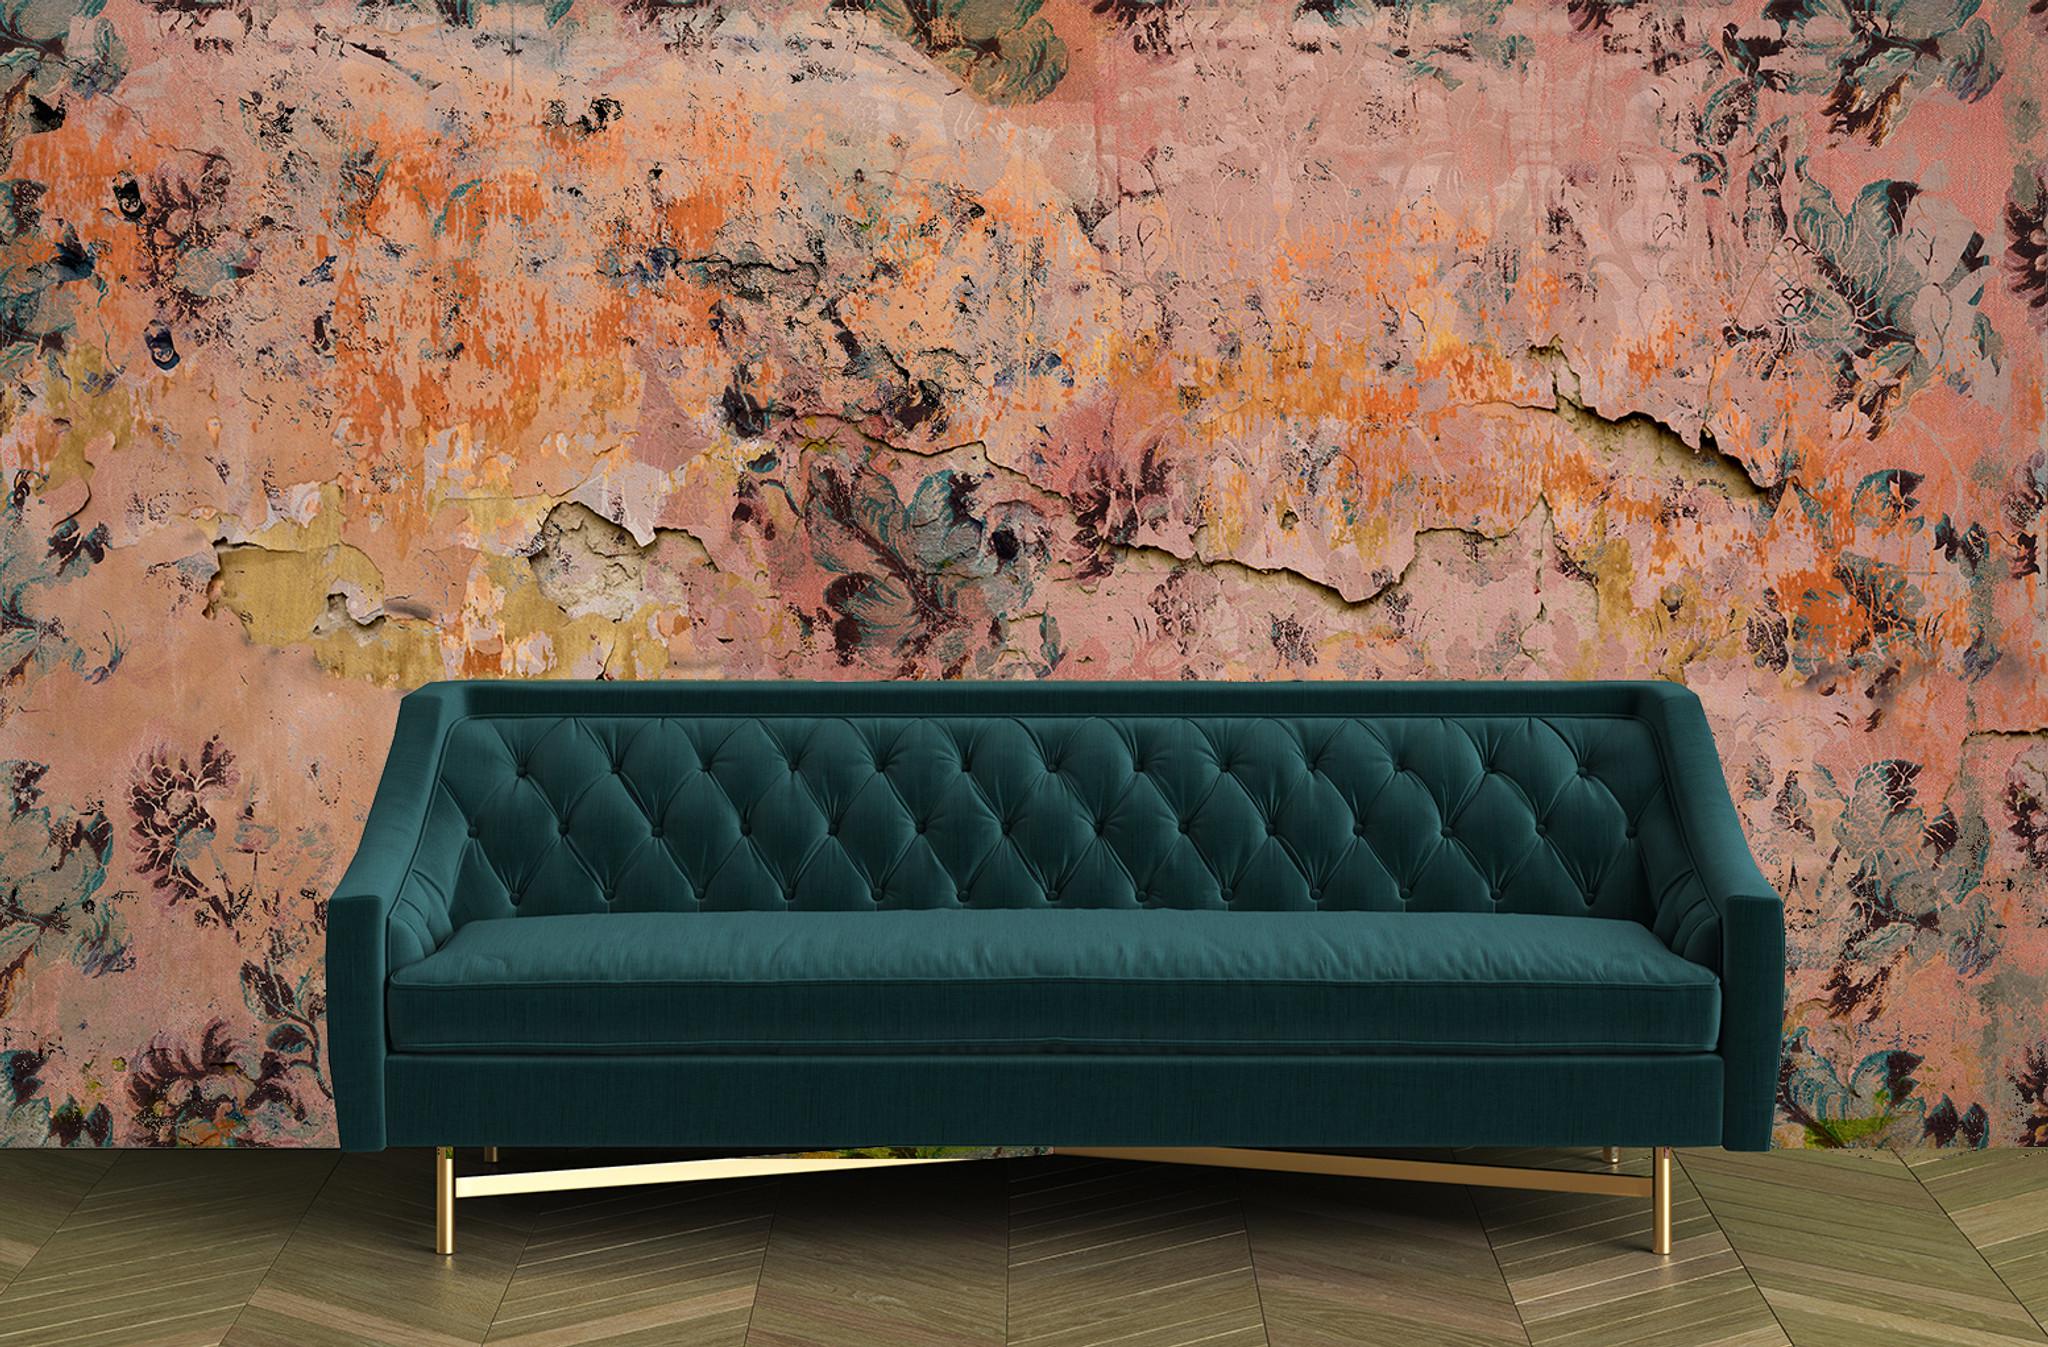 Wallpaper - Faded Empire - Fragmented Orange